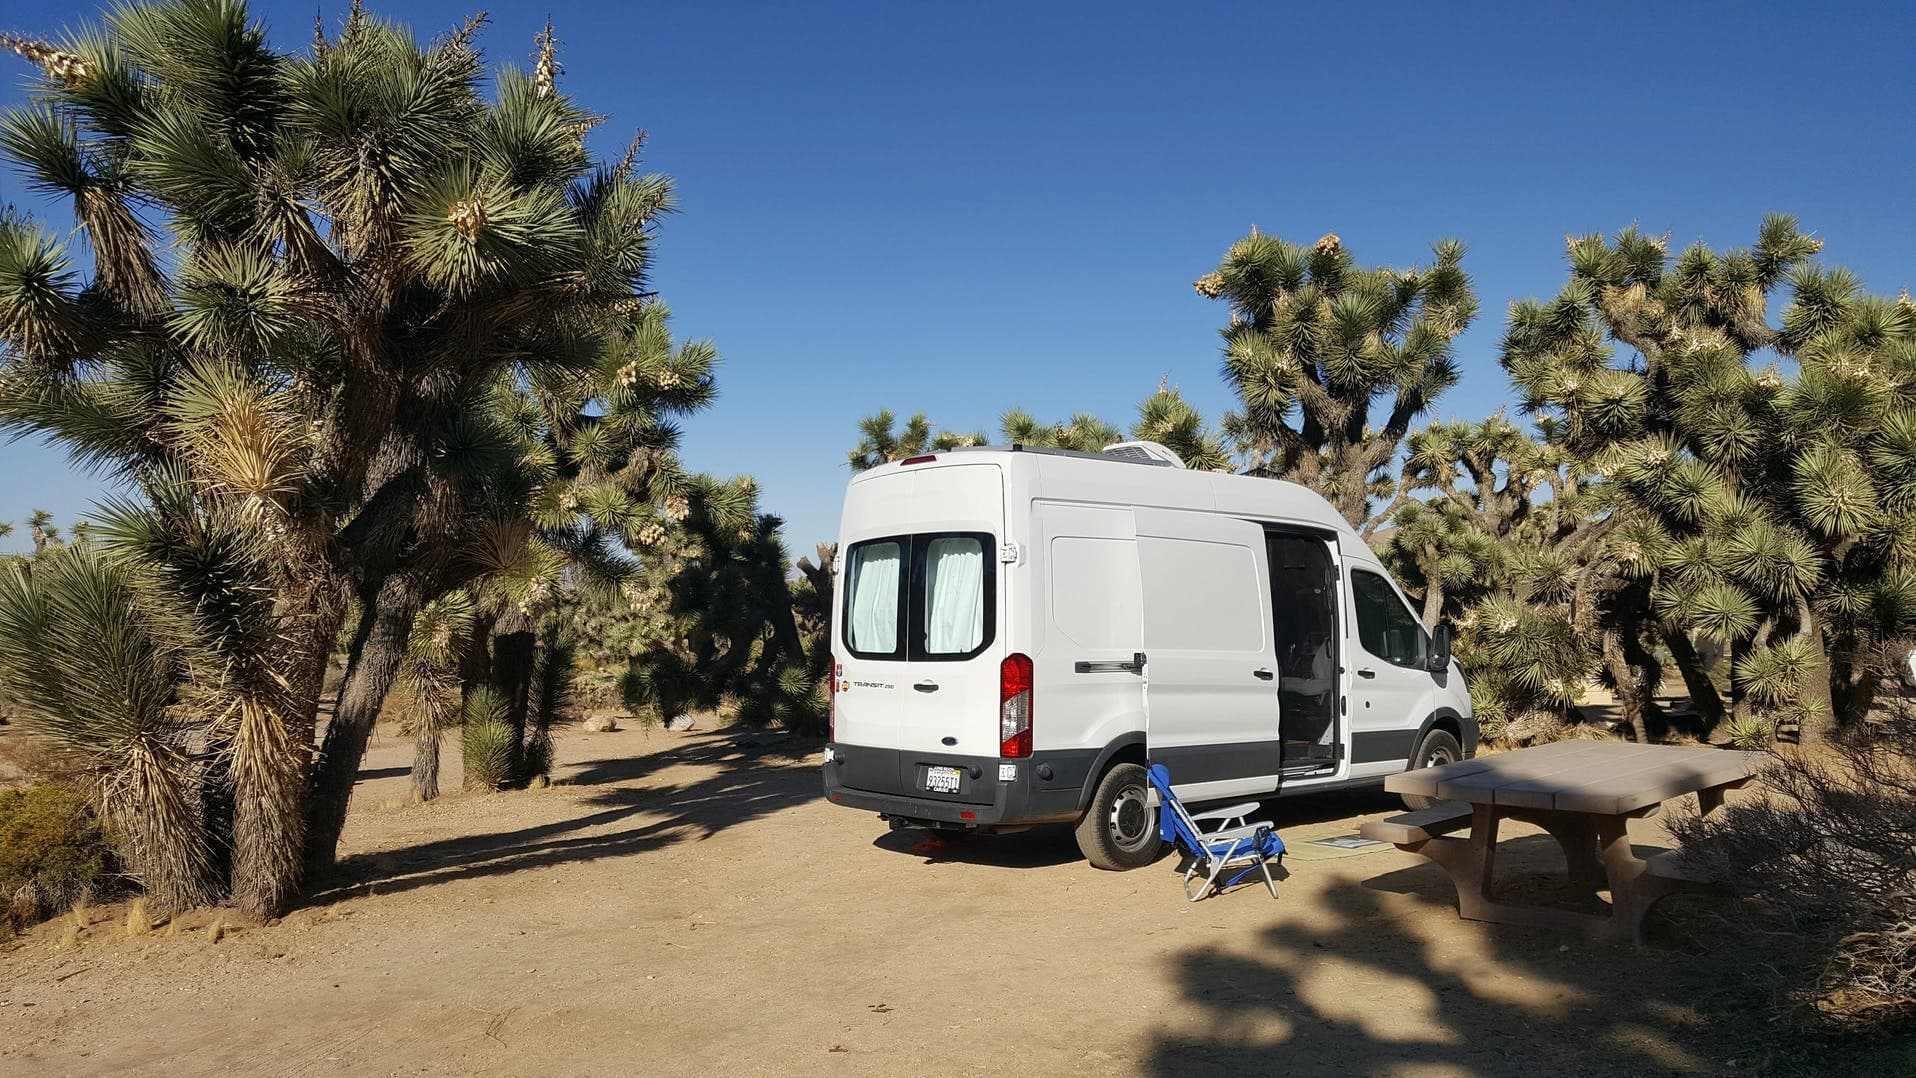 White sprinter van at a campsite in a desert near Palm Springs.